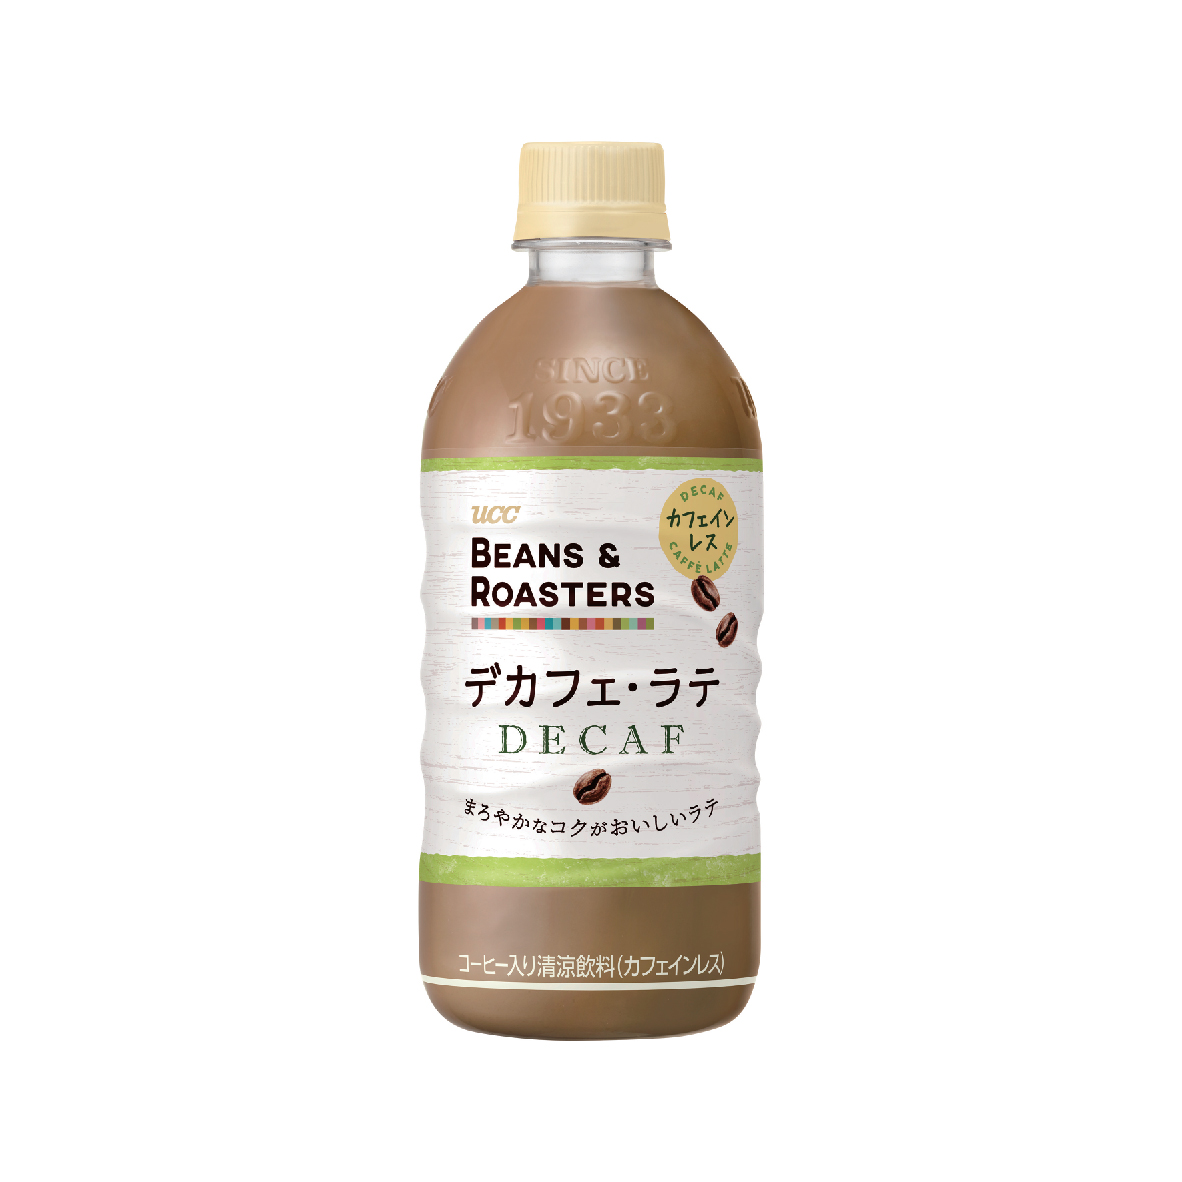 UCC Beans & Roasters Decaf Latte PET